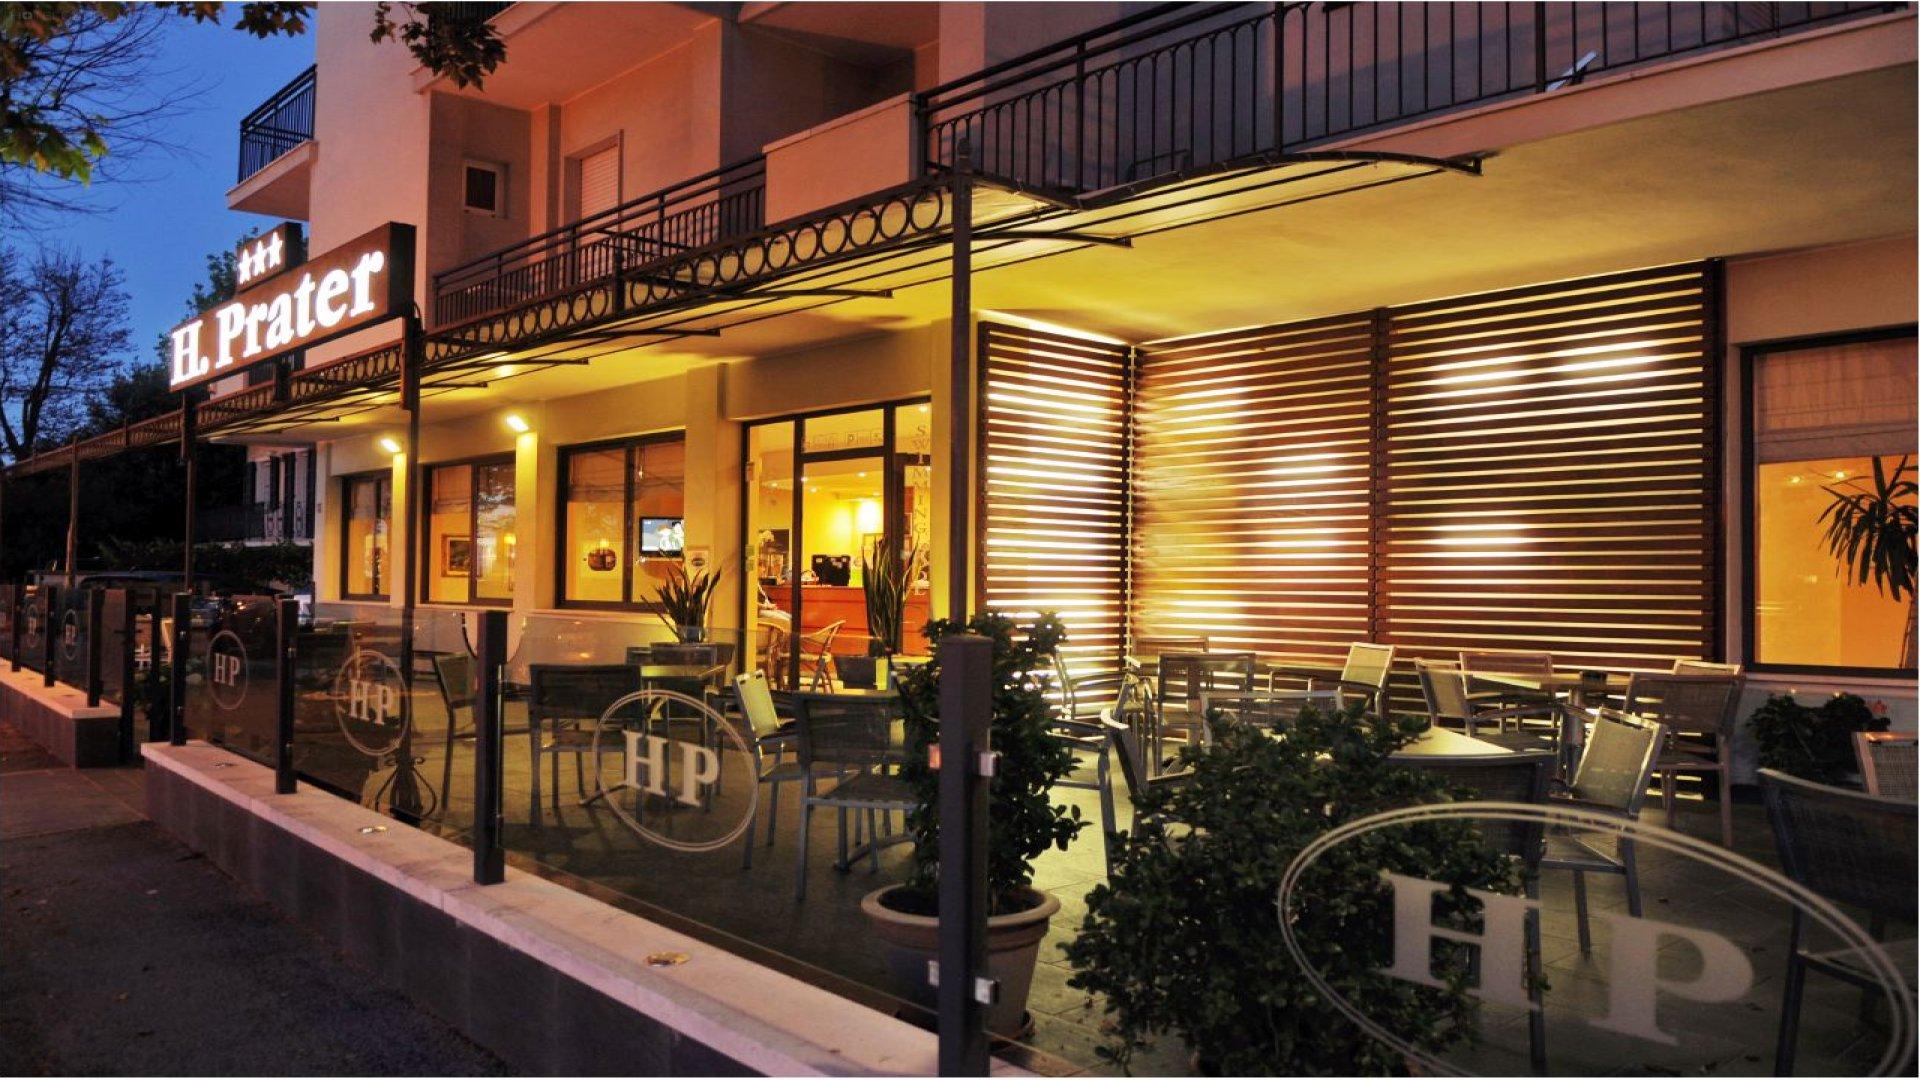 Hotel Prater 8